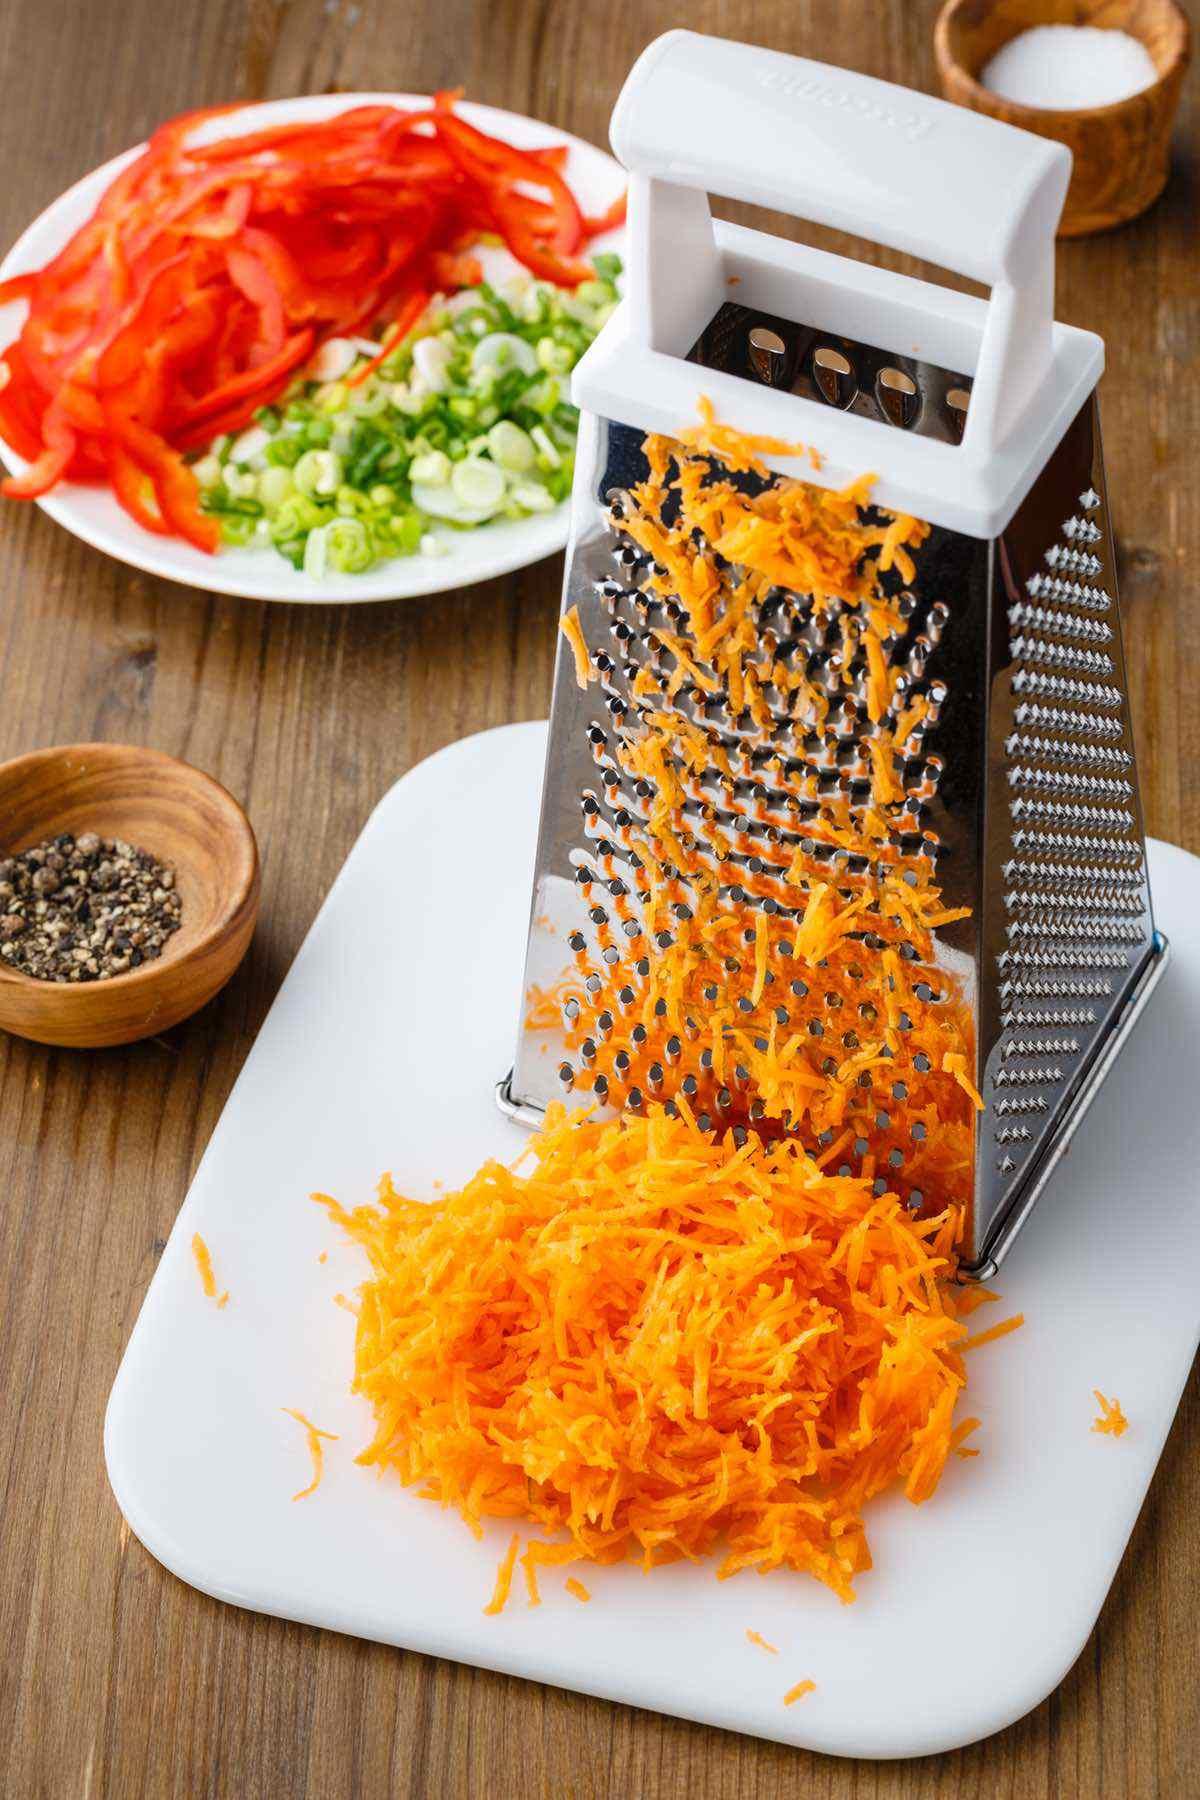 shredding carrots